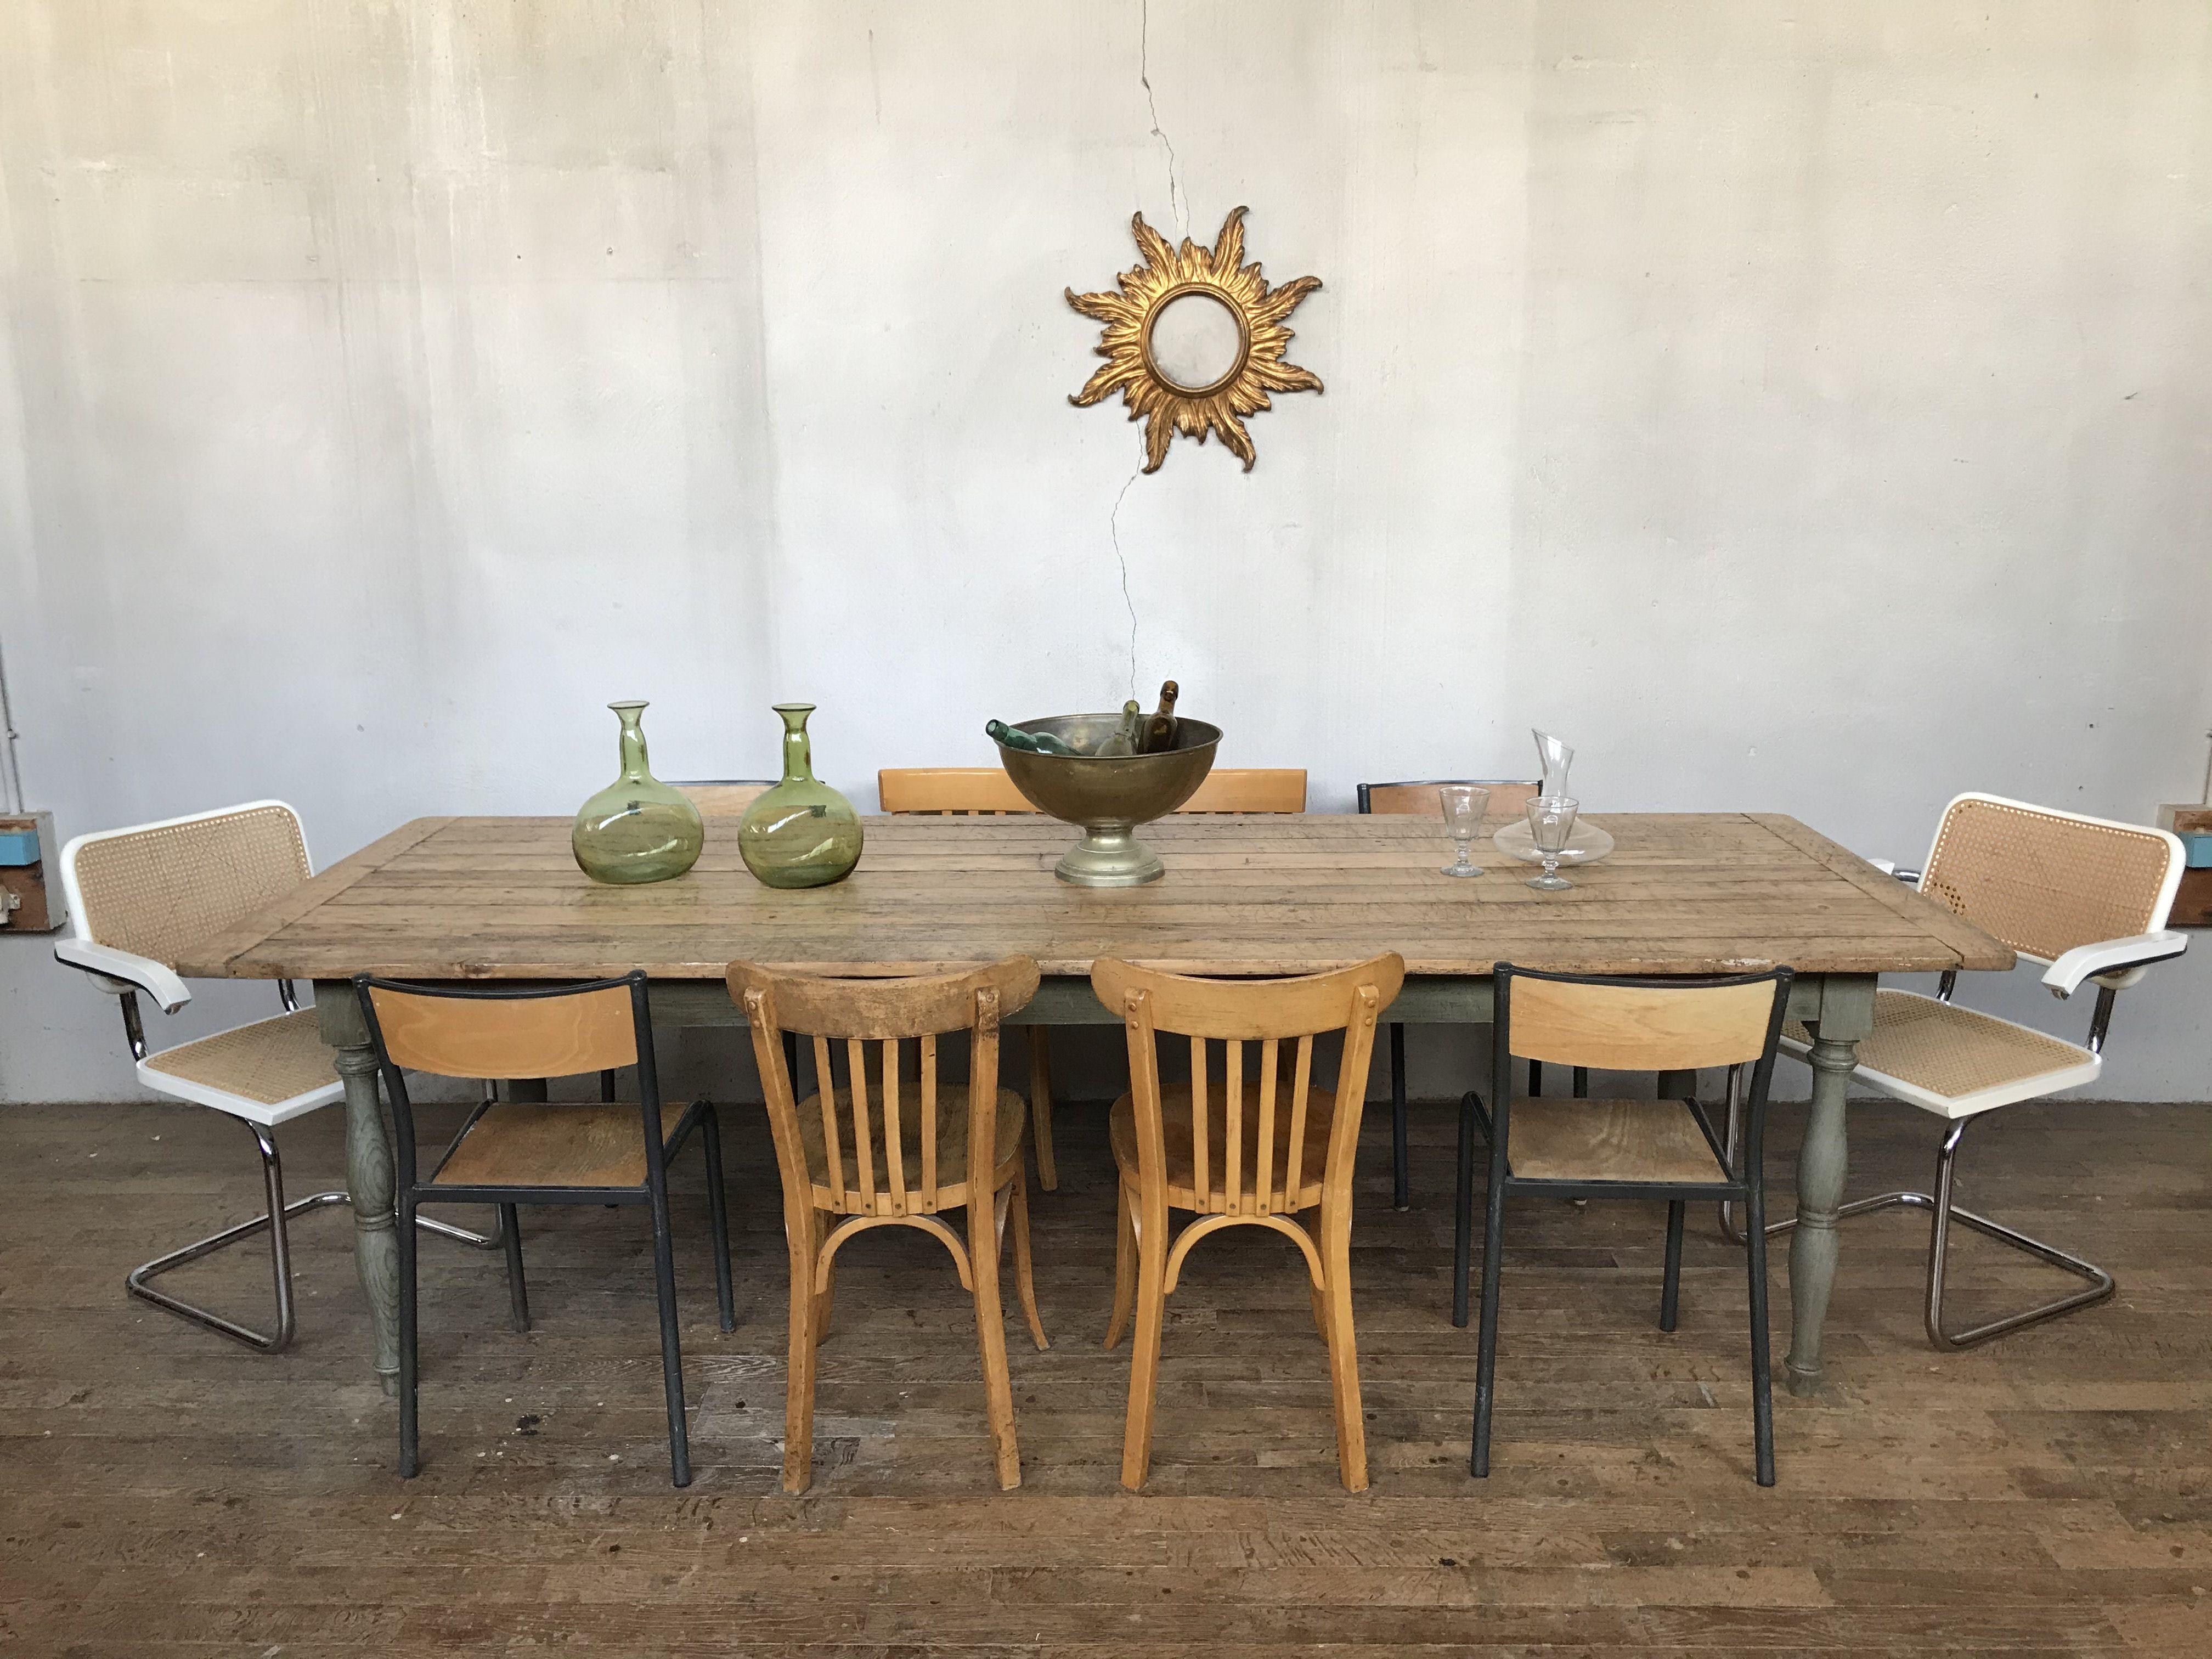 Grande table de ferme vintage en sapin